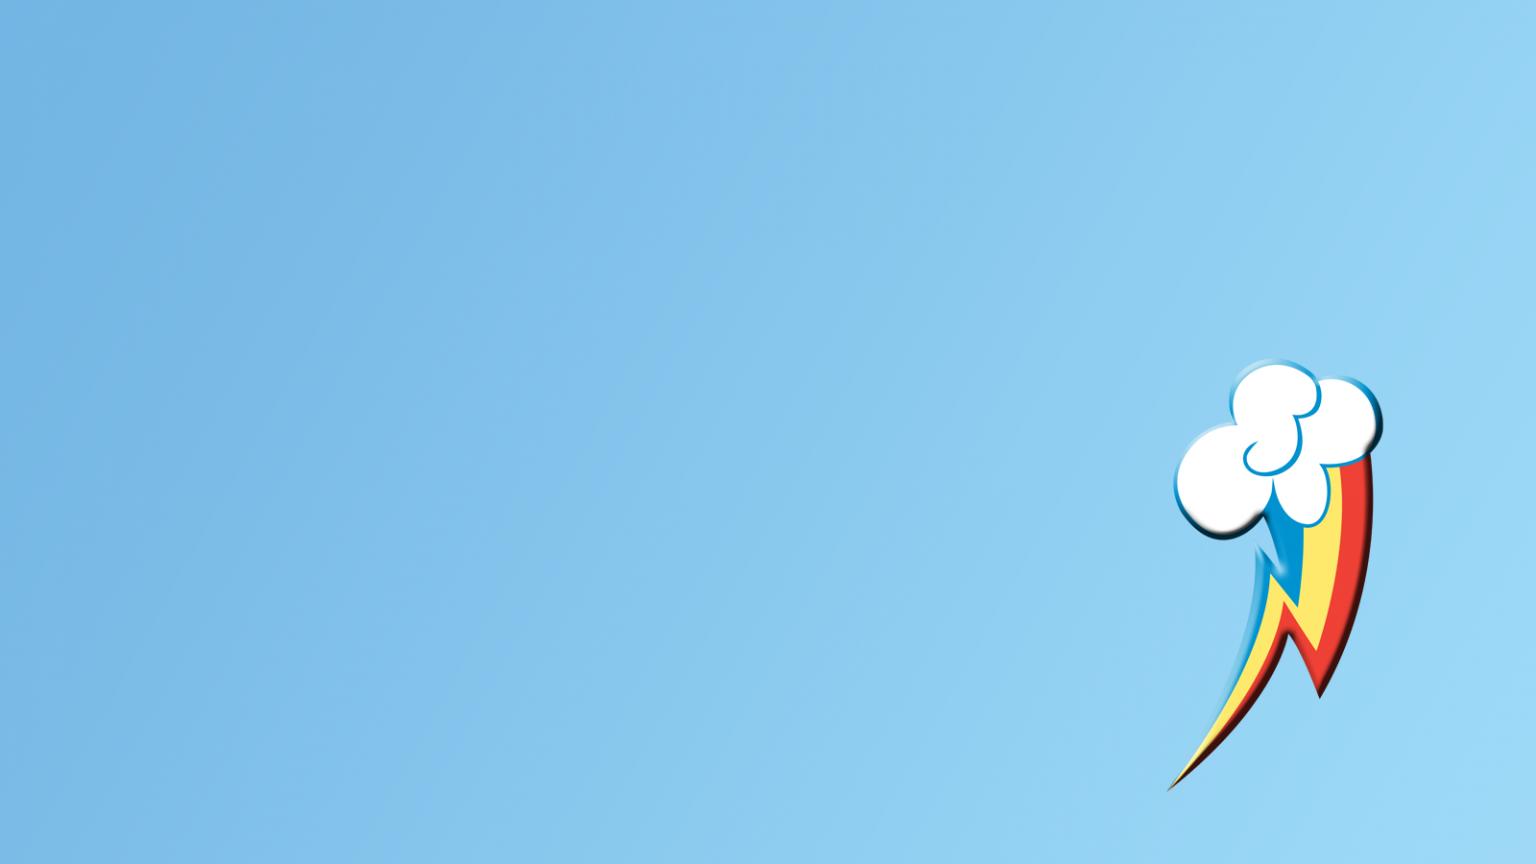 Free Download Rainbow Dash Cutie Mark Wallpaper By Freakin Ninja